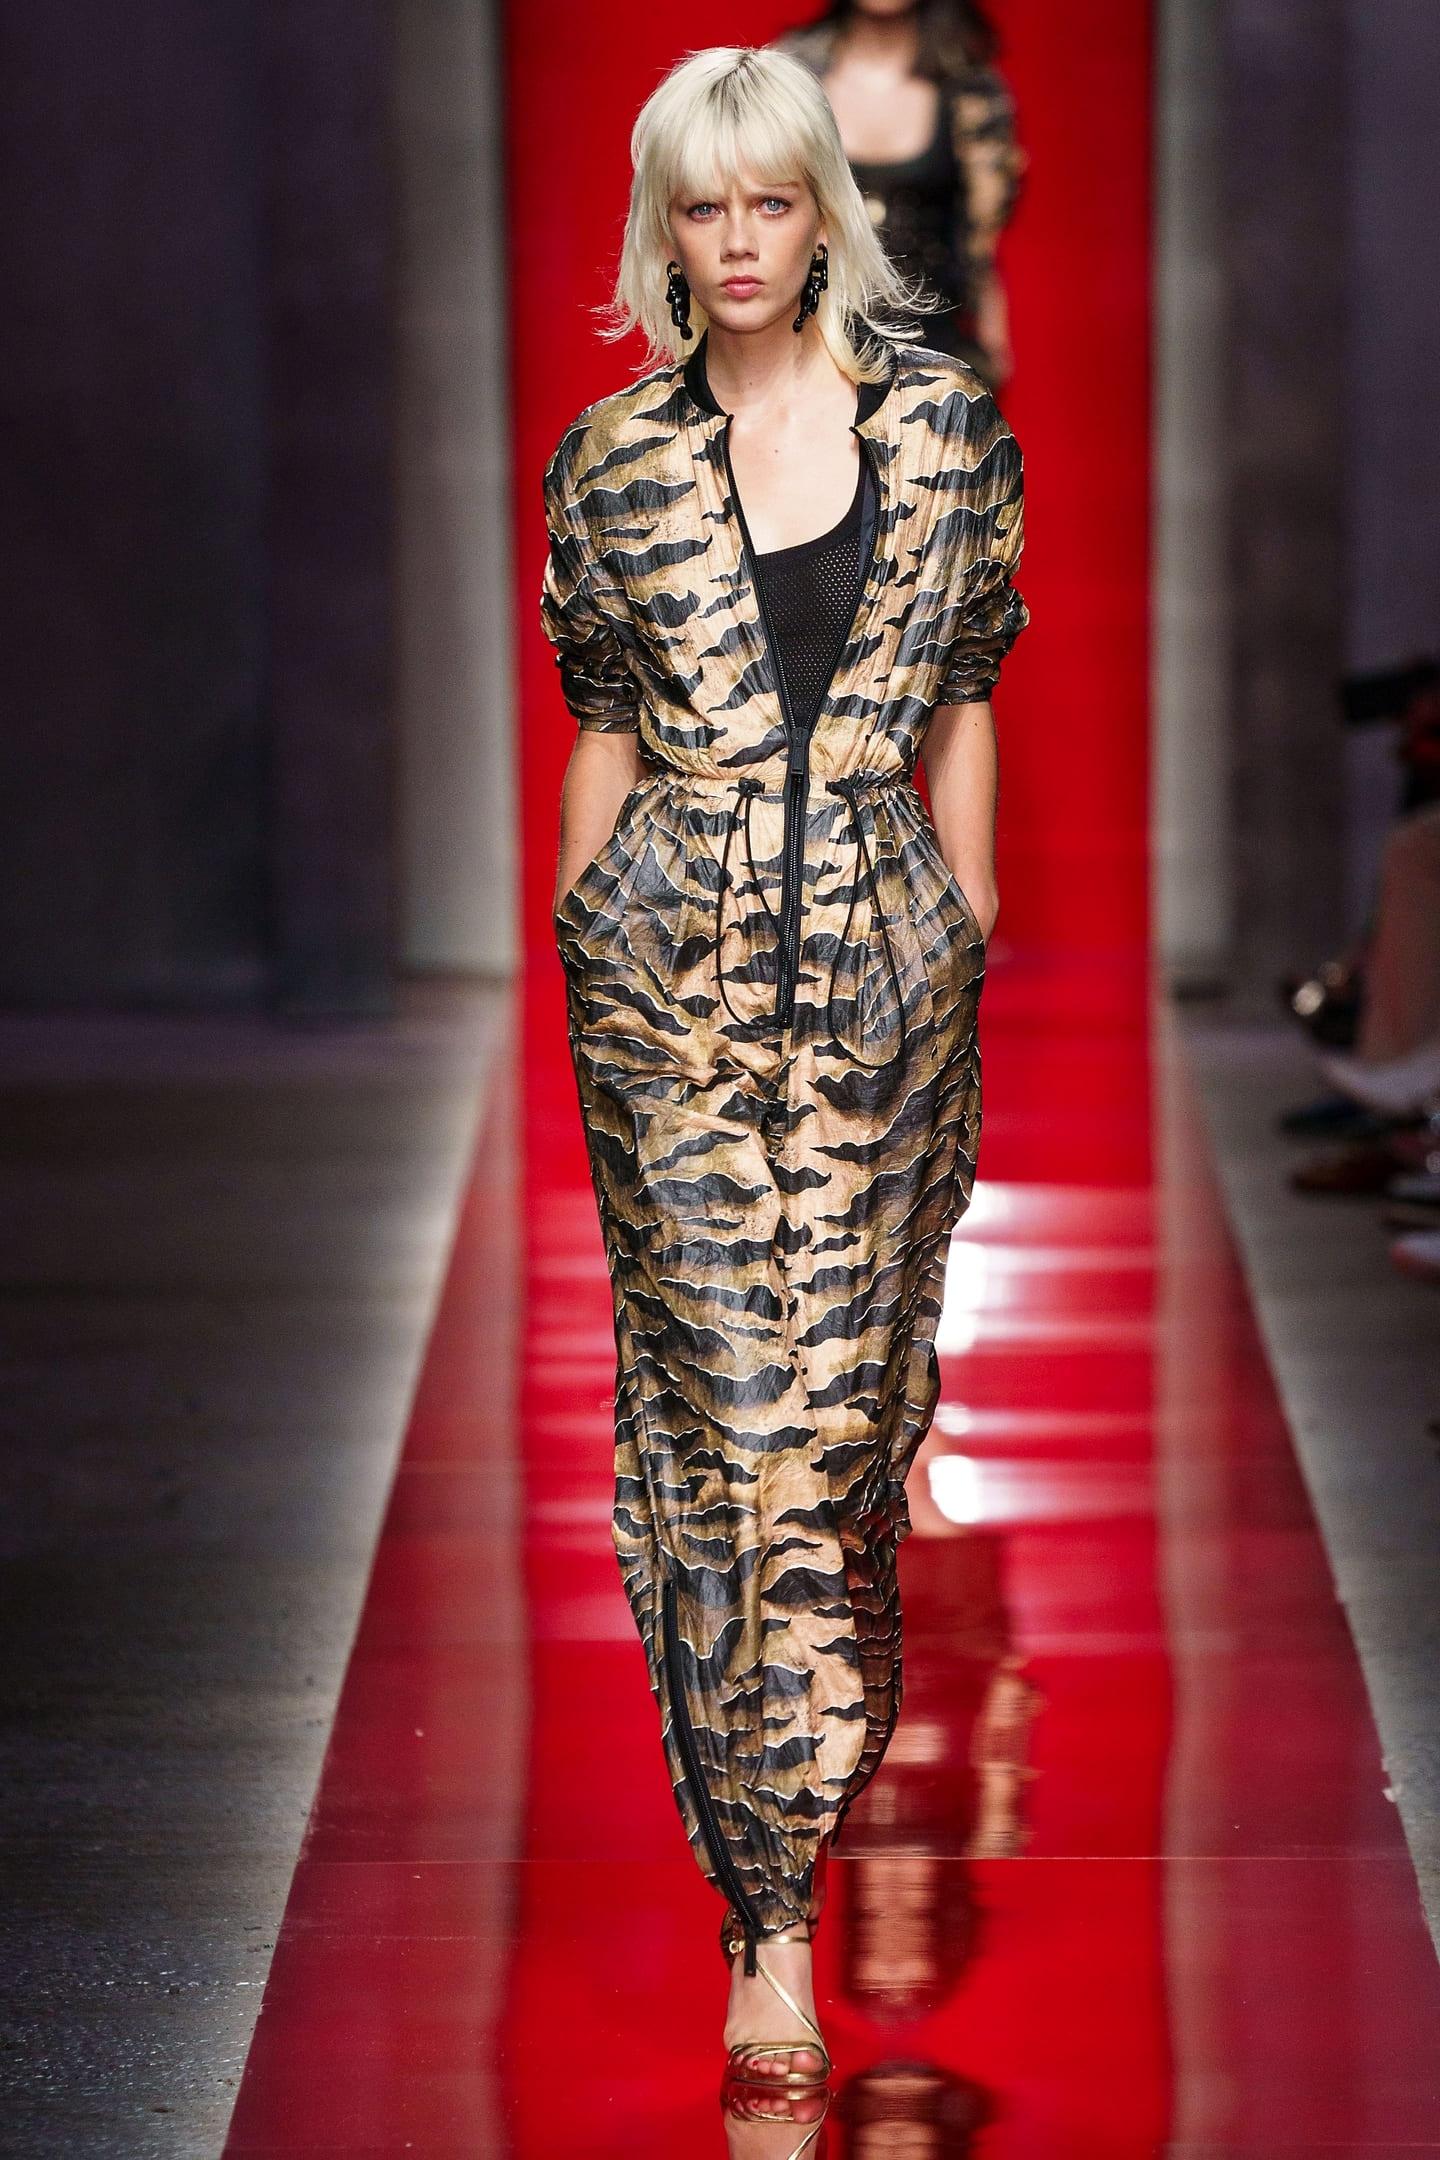 Dsquared2 Spring/Summer 2020 Menswear - обзор новой коллекции